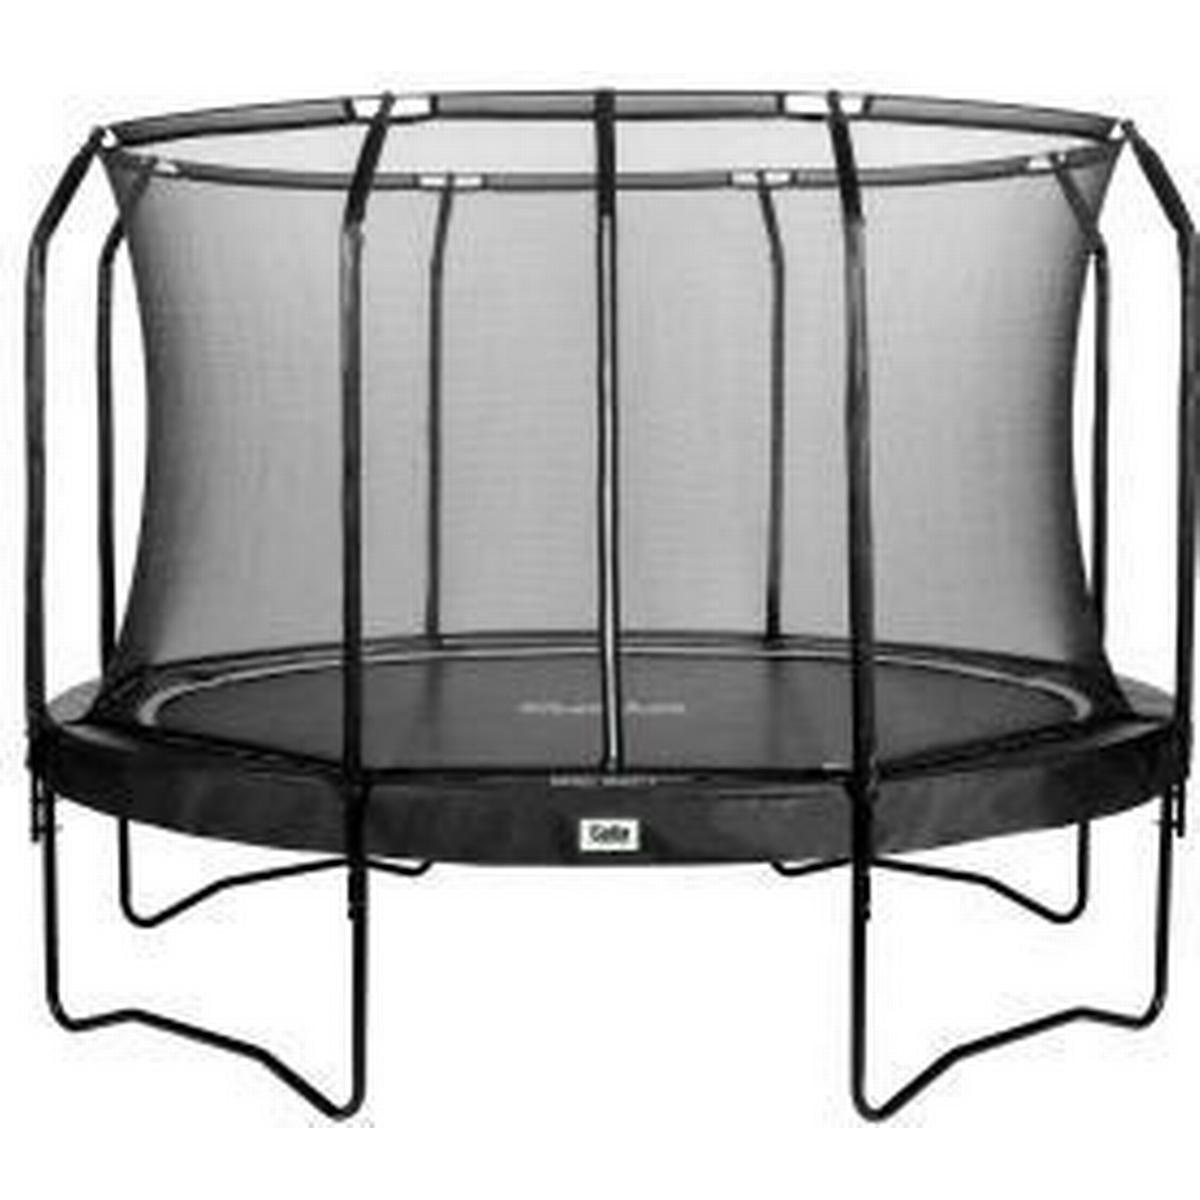 Smart Trampolin - Sammenlign priser på trampoliner hos PriceRunner TI28